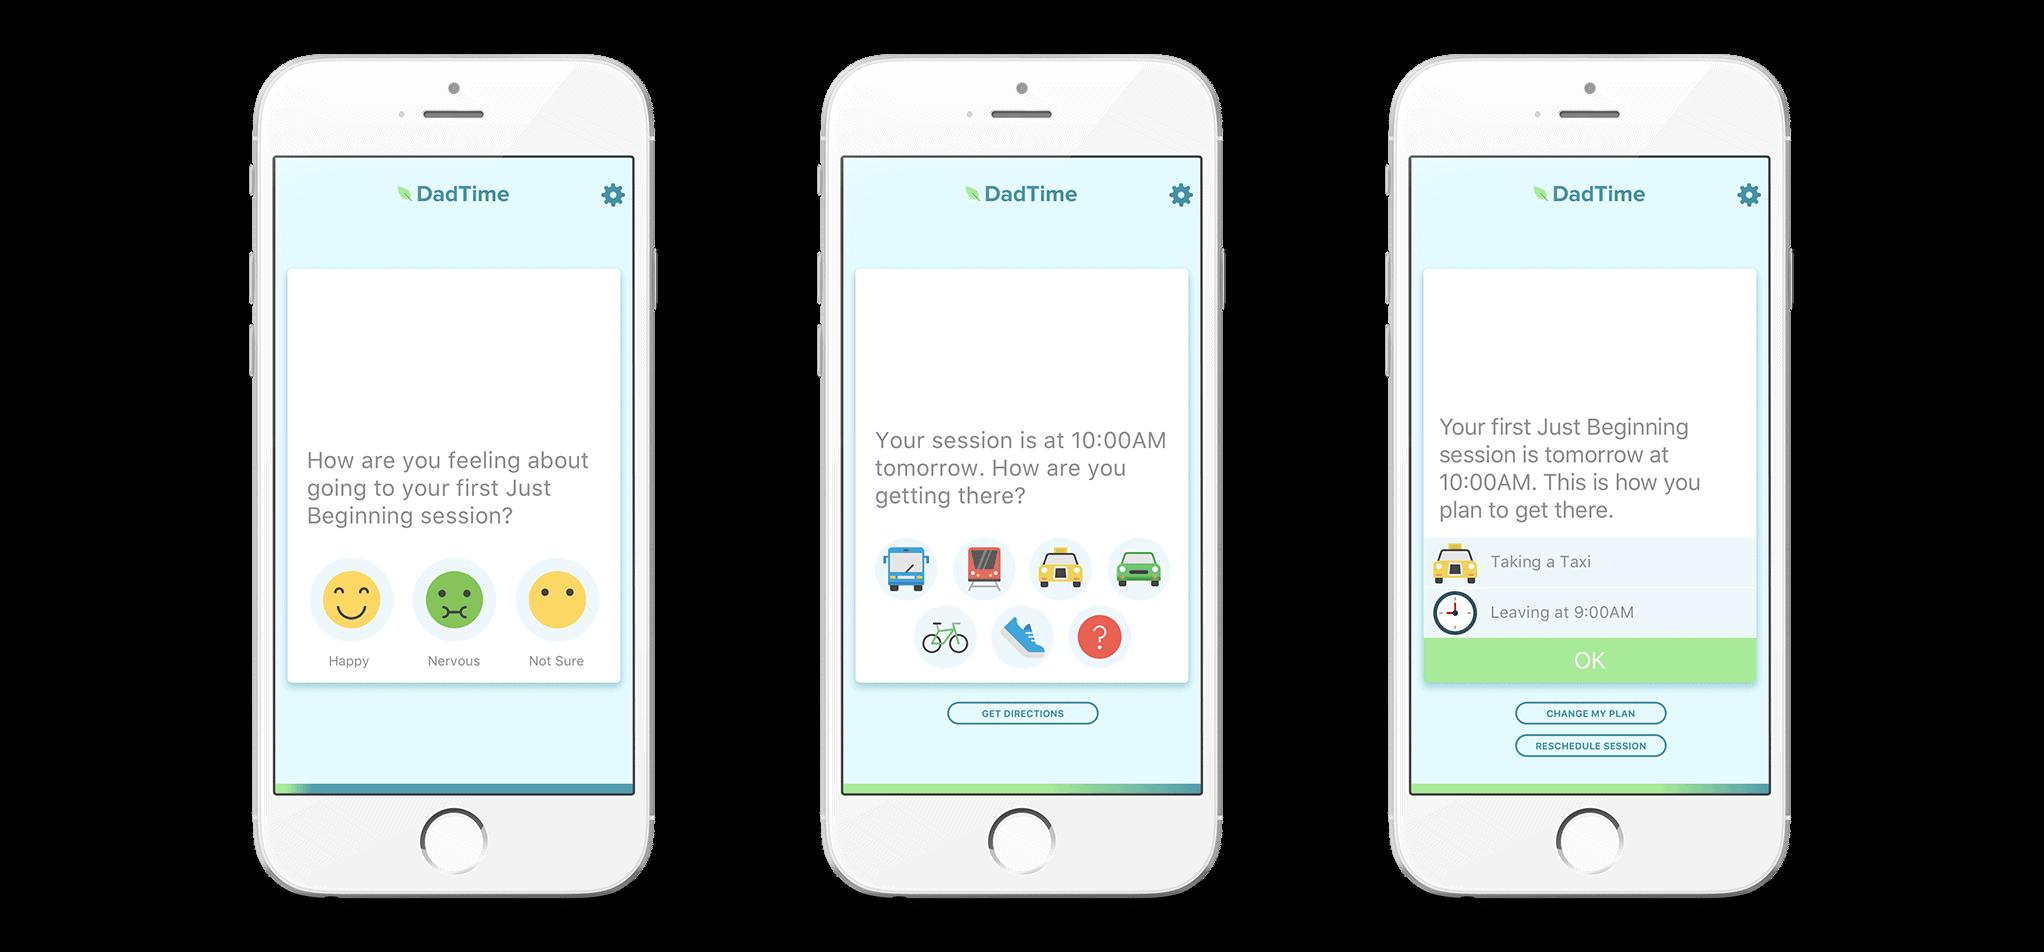 Three views of the Dadtime app